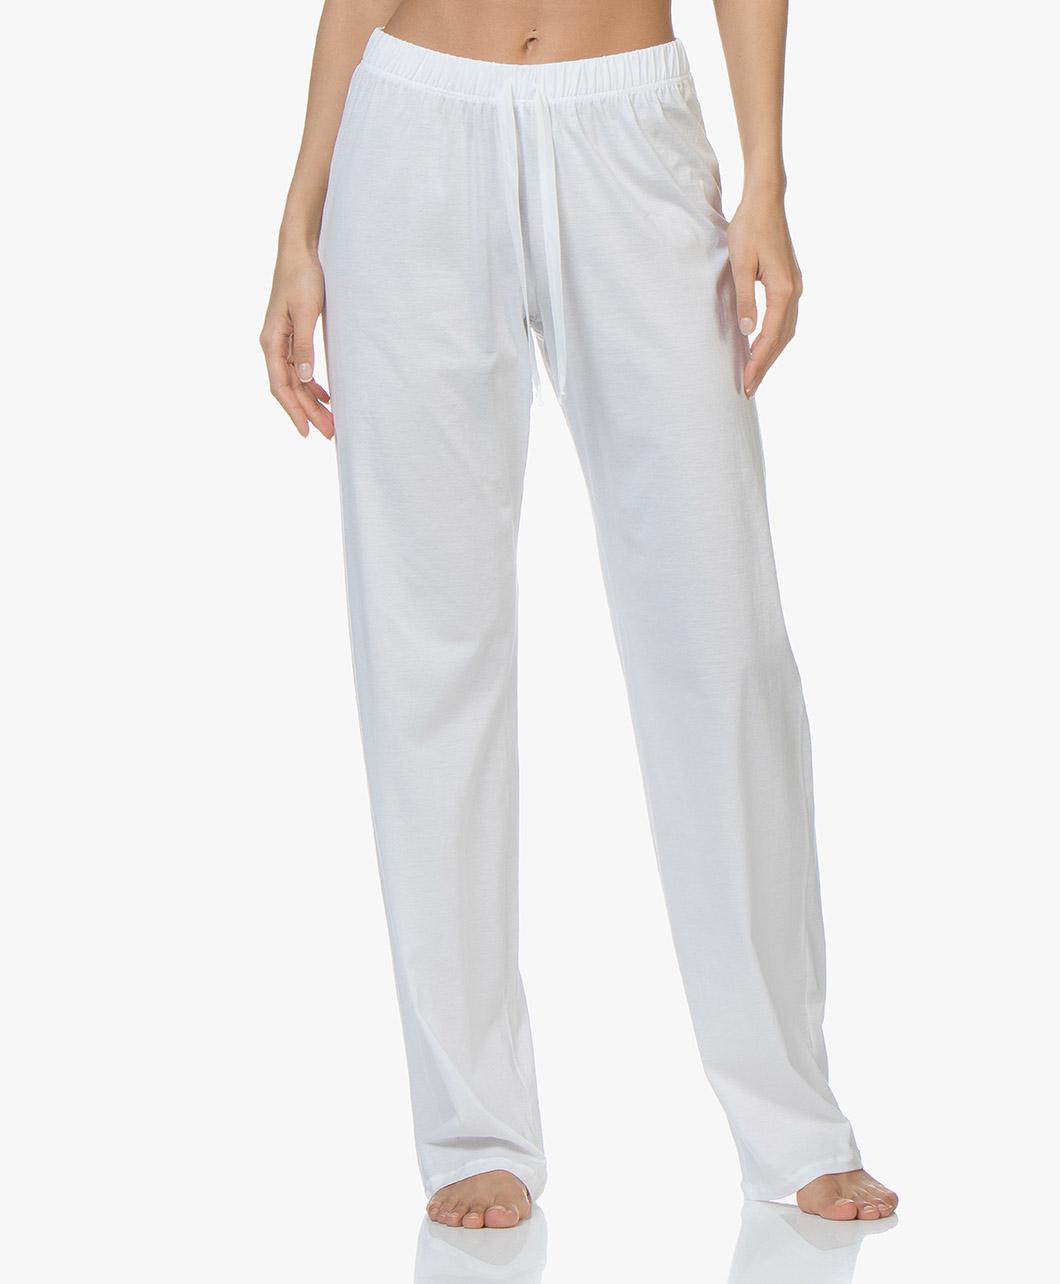 HANRO Cotton Deluxe Jersey Pajama Pants White long pants